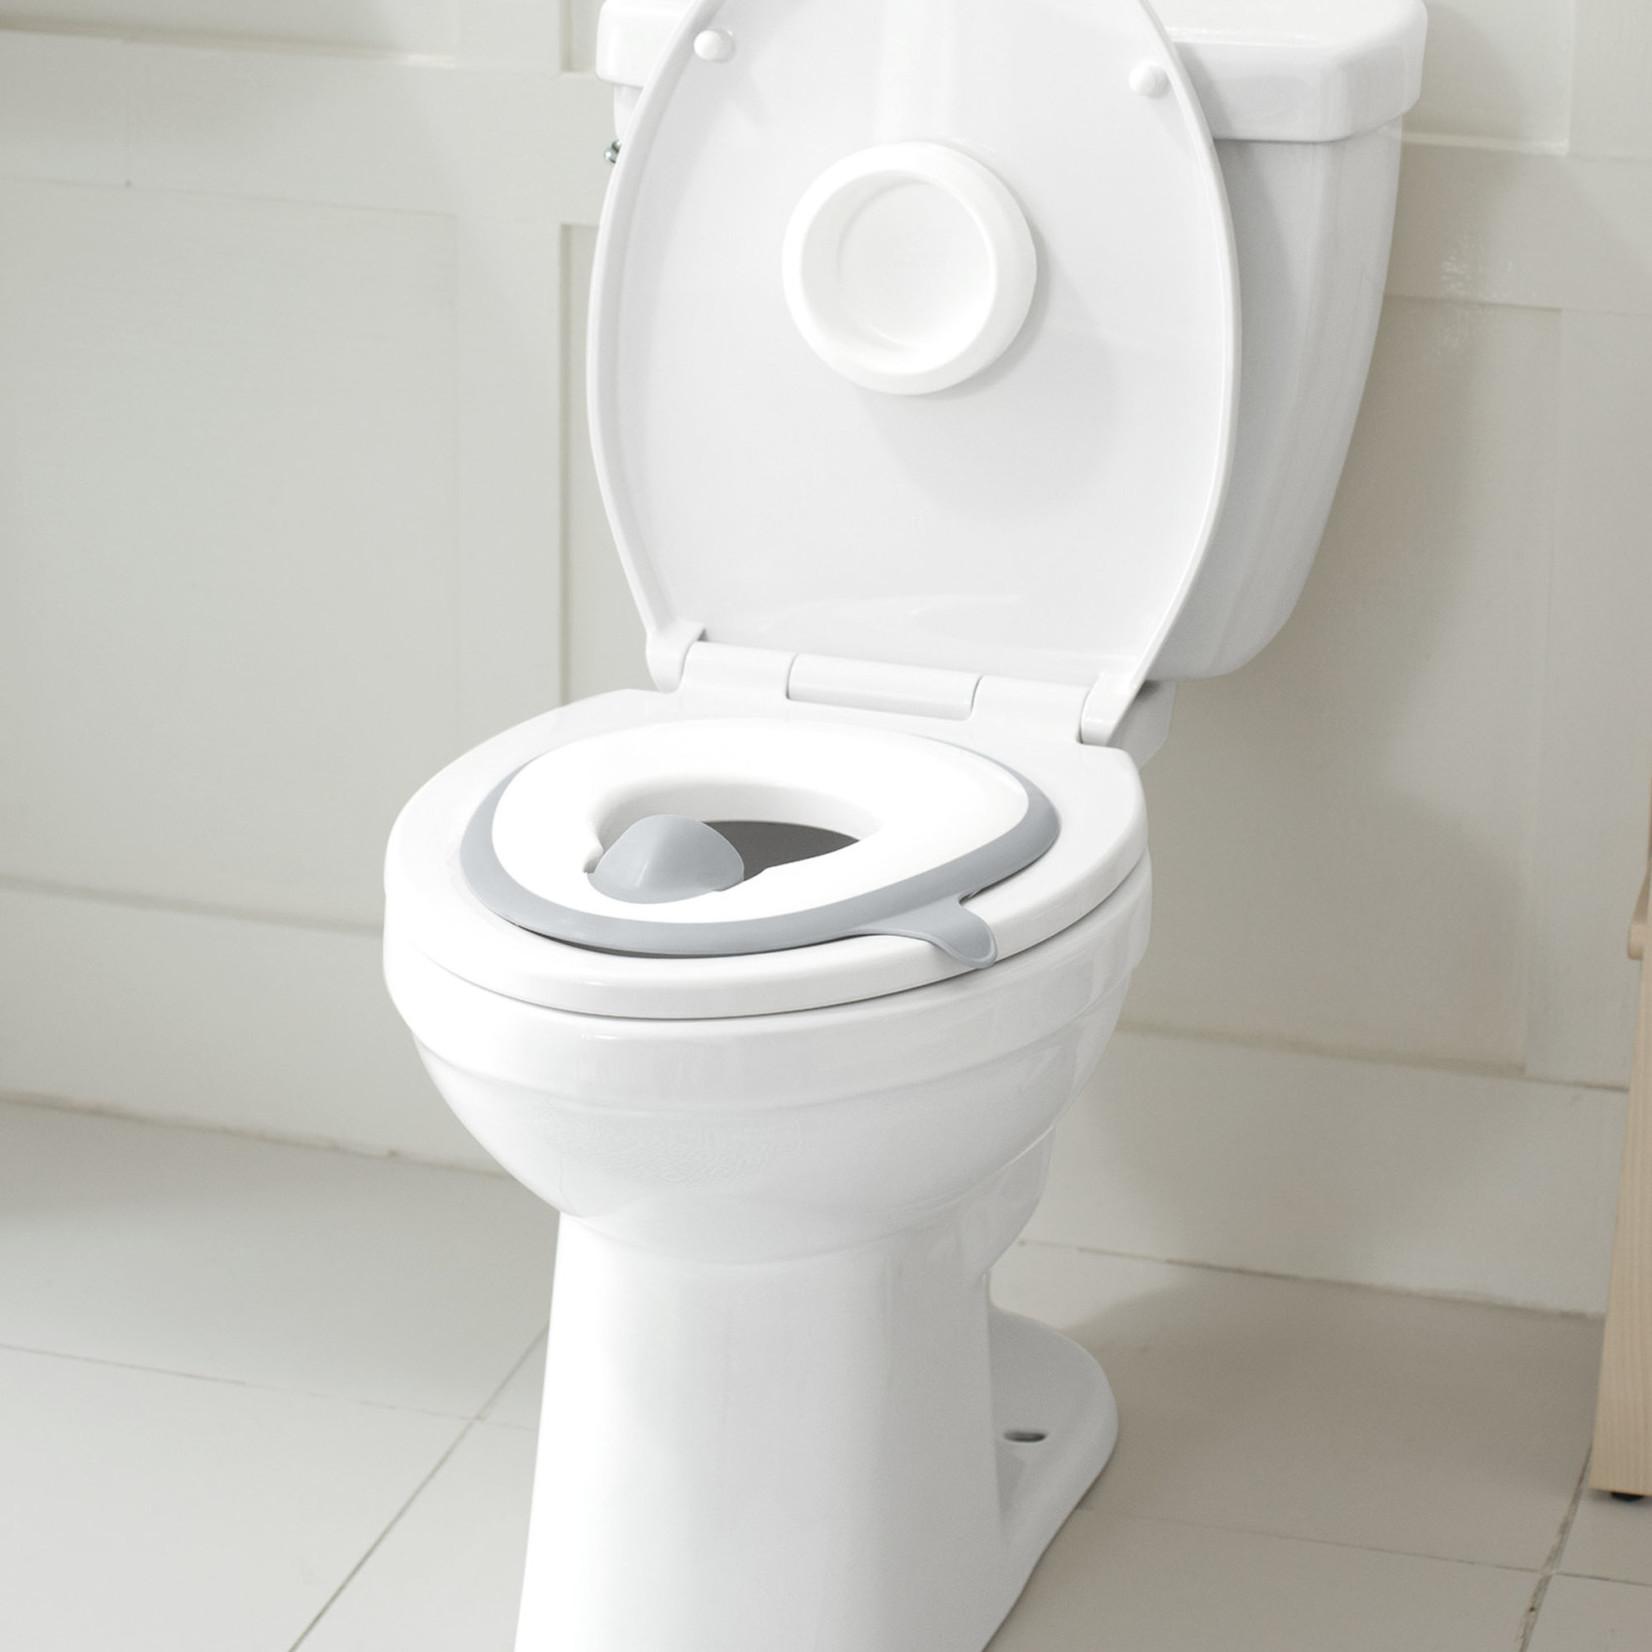 SKIP HOP Easy Store Toilet Trainer